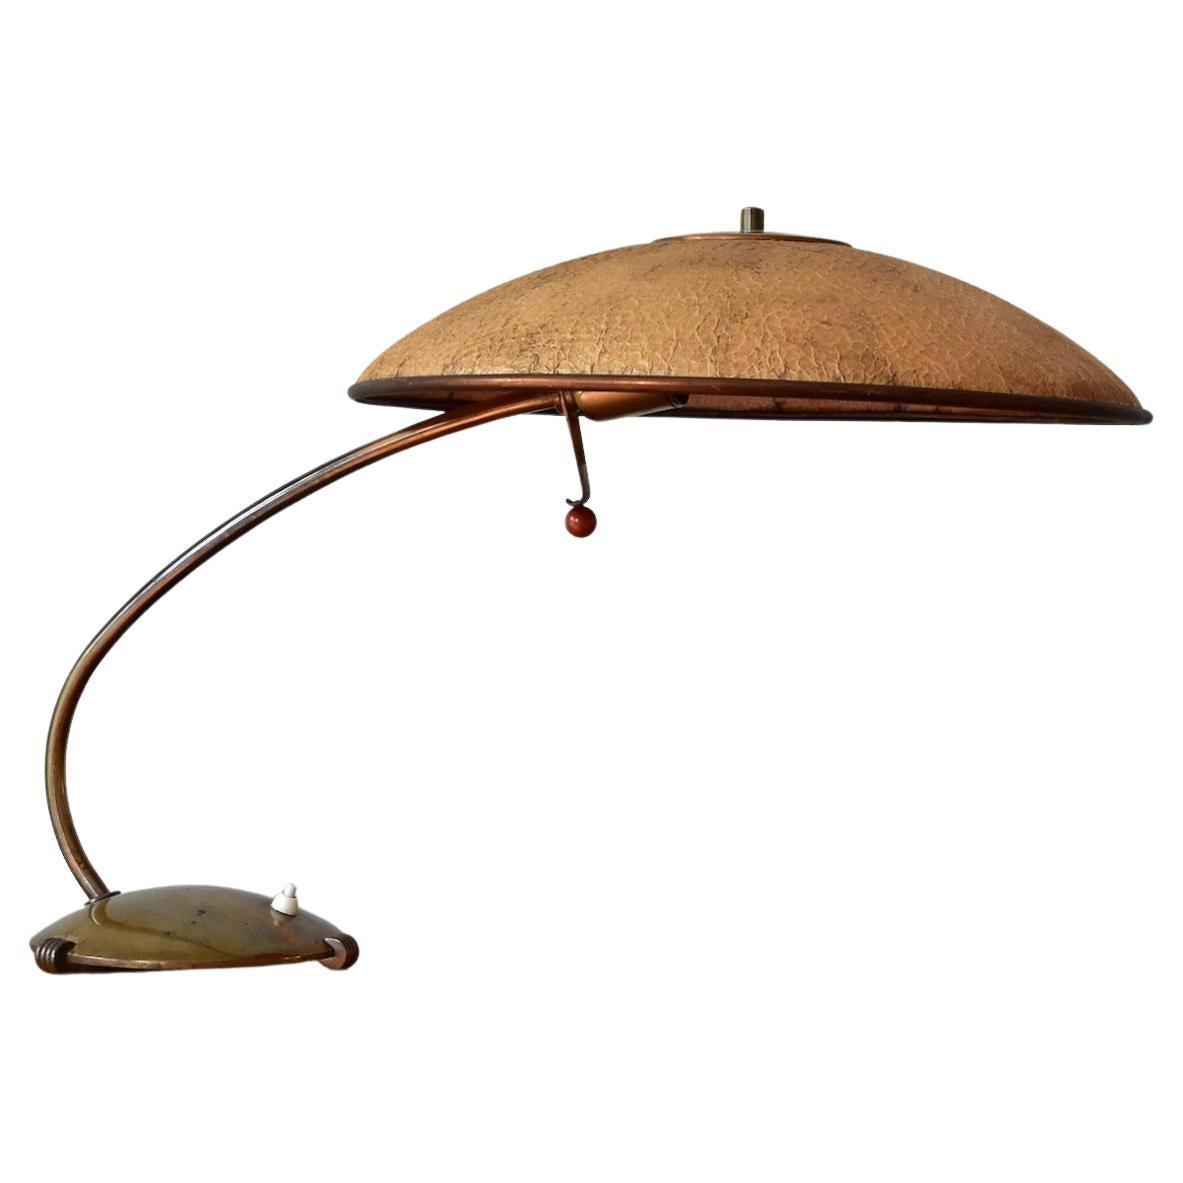 Diffuna Table Lamp 1930's by Schanzenbach & Co Frankfurt, Germany